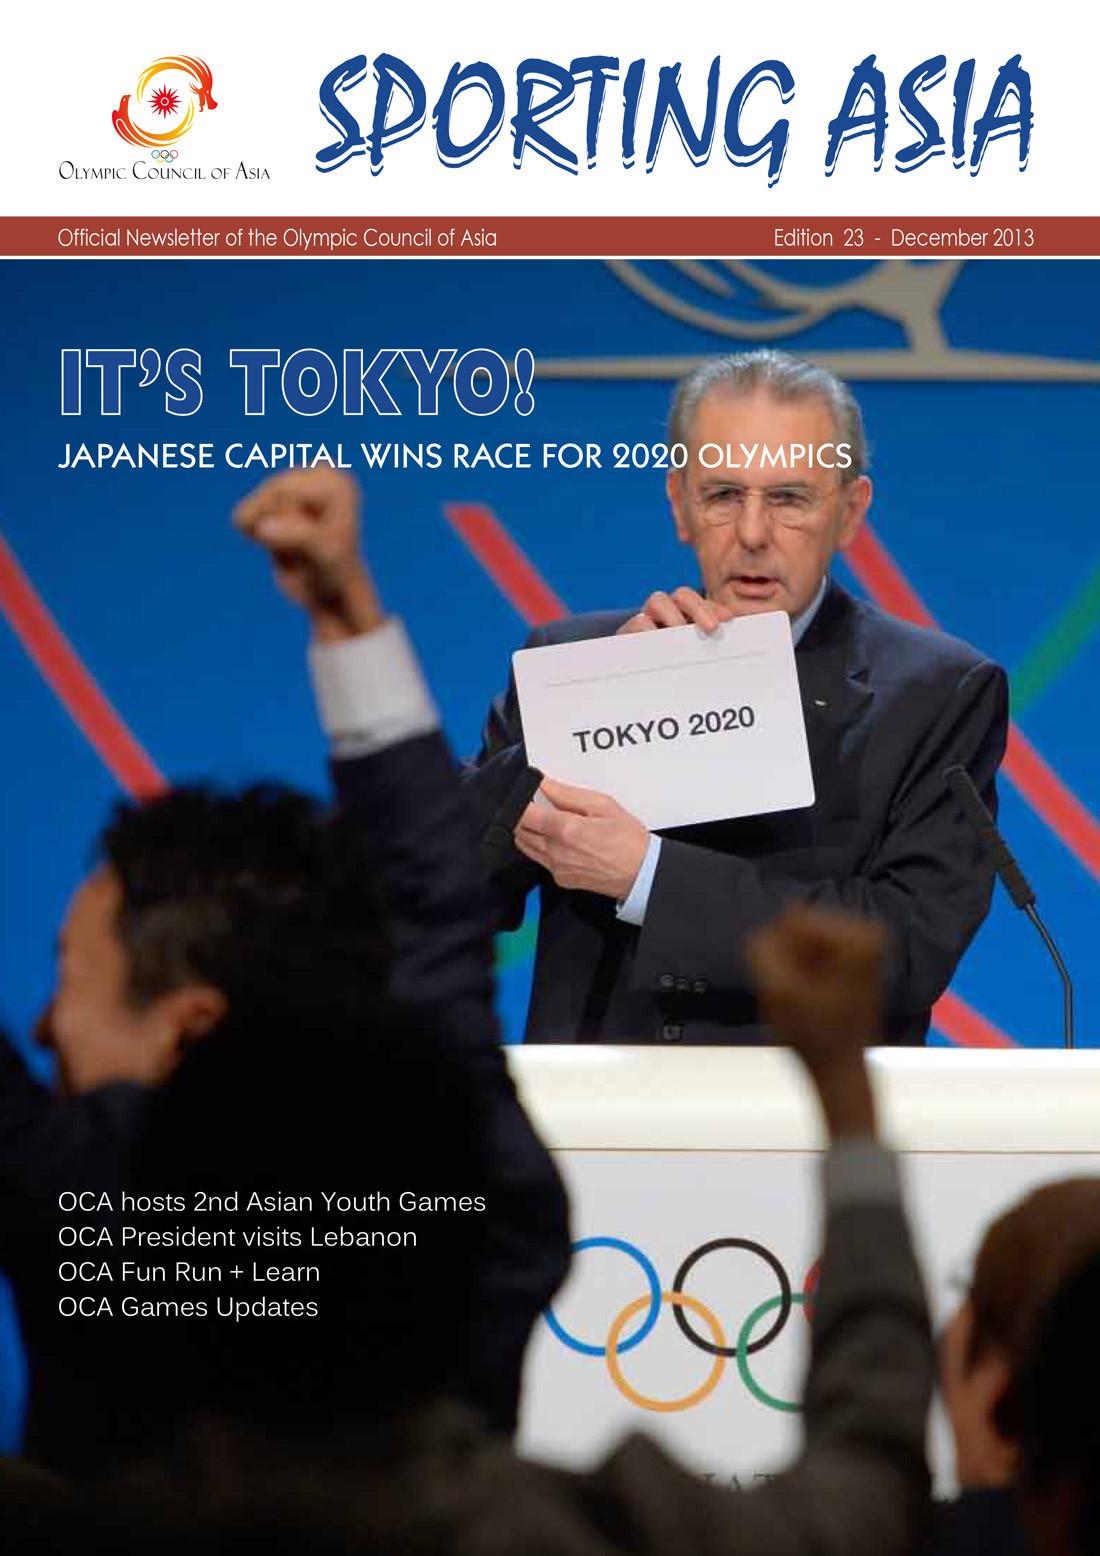 Sporting Asia - Edition 23 - DEC 2013